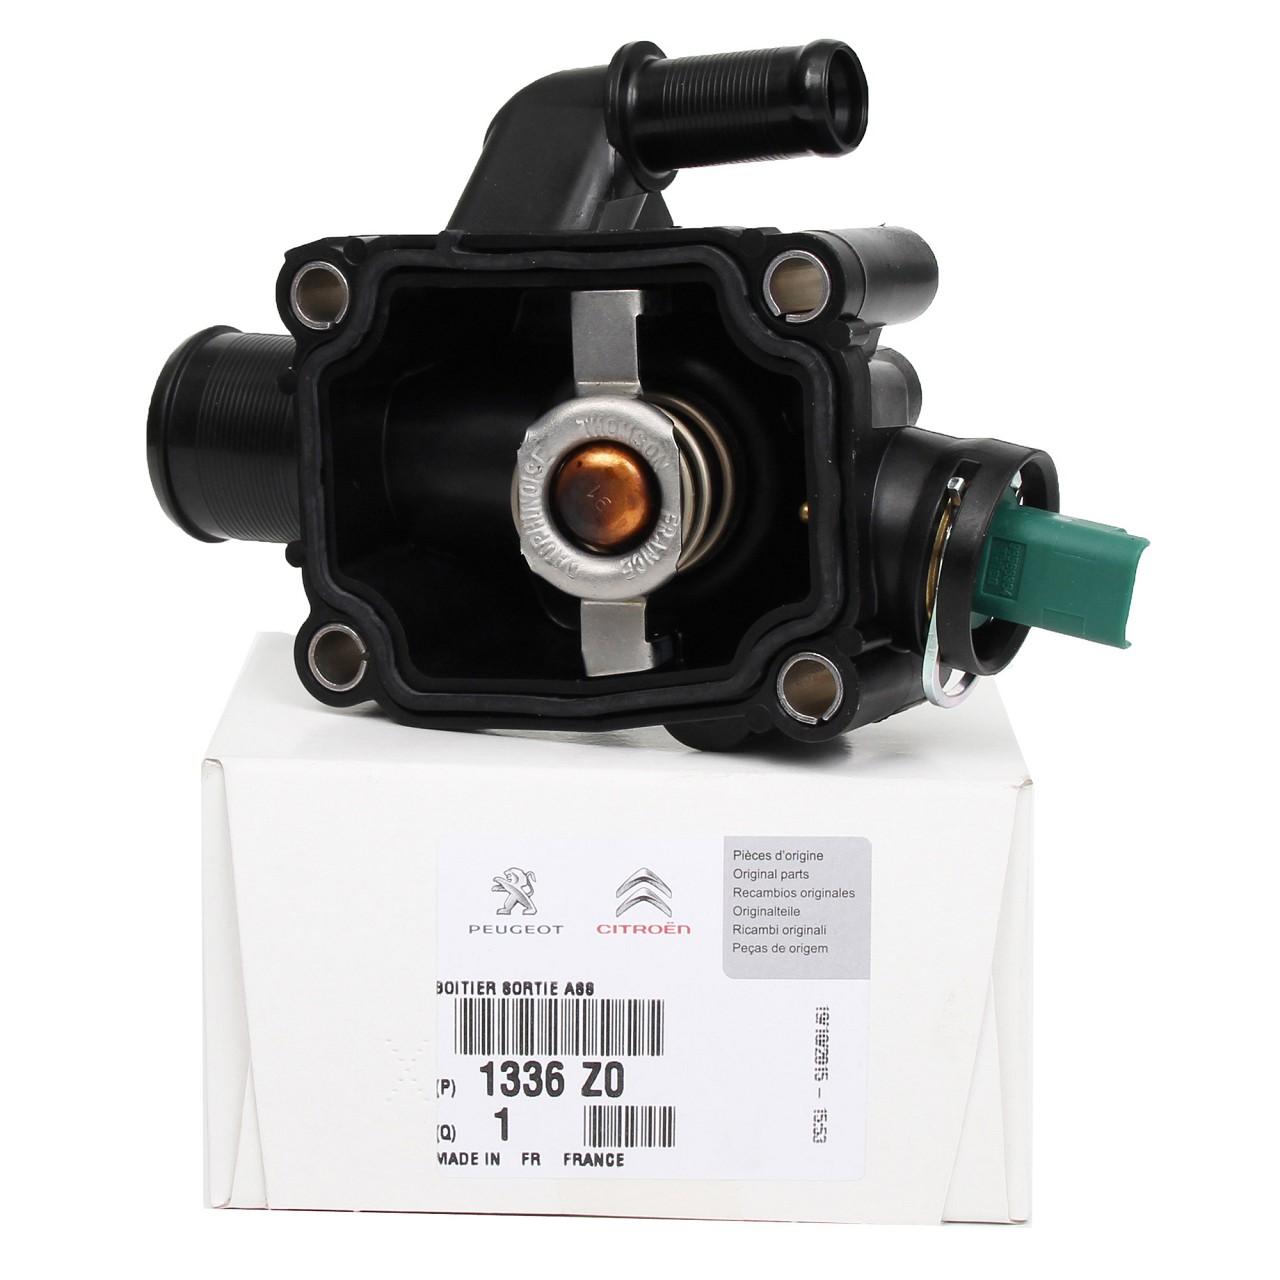 ORIGINAL Citroen Peugeot Thermostat + Gehäuse C2 C3 C4 206 207 307 308 1336.Z0